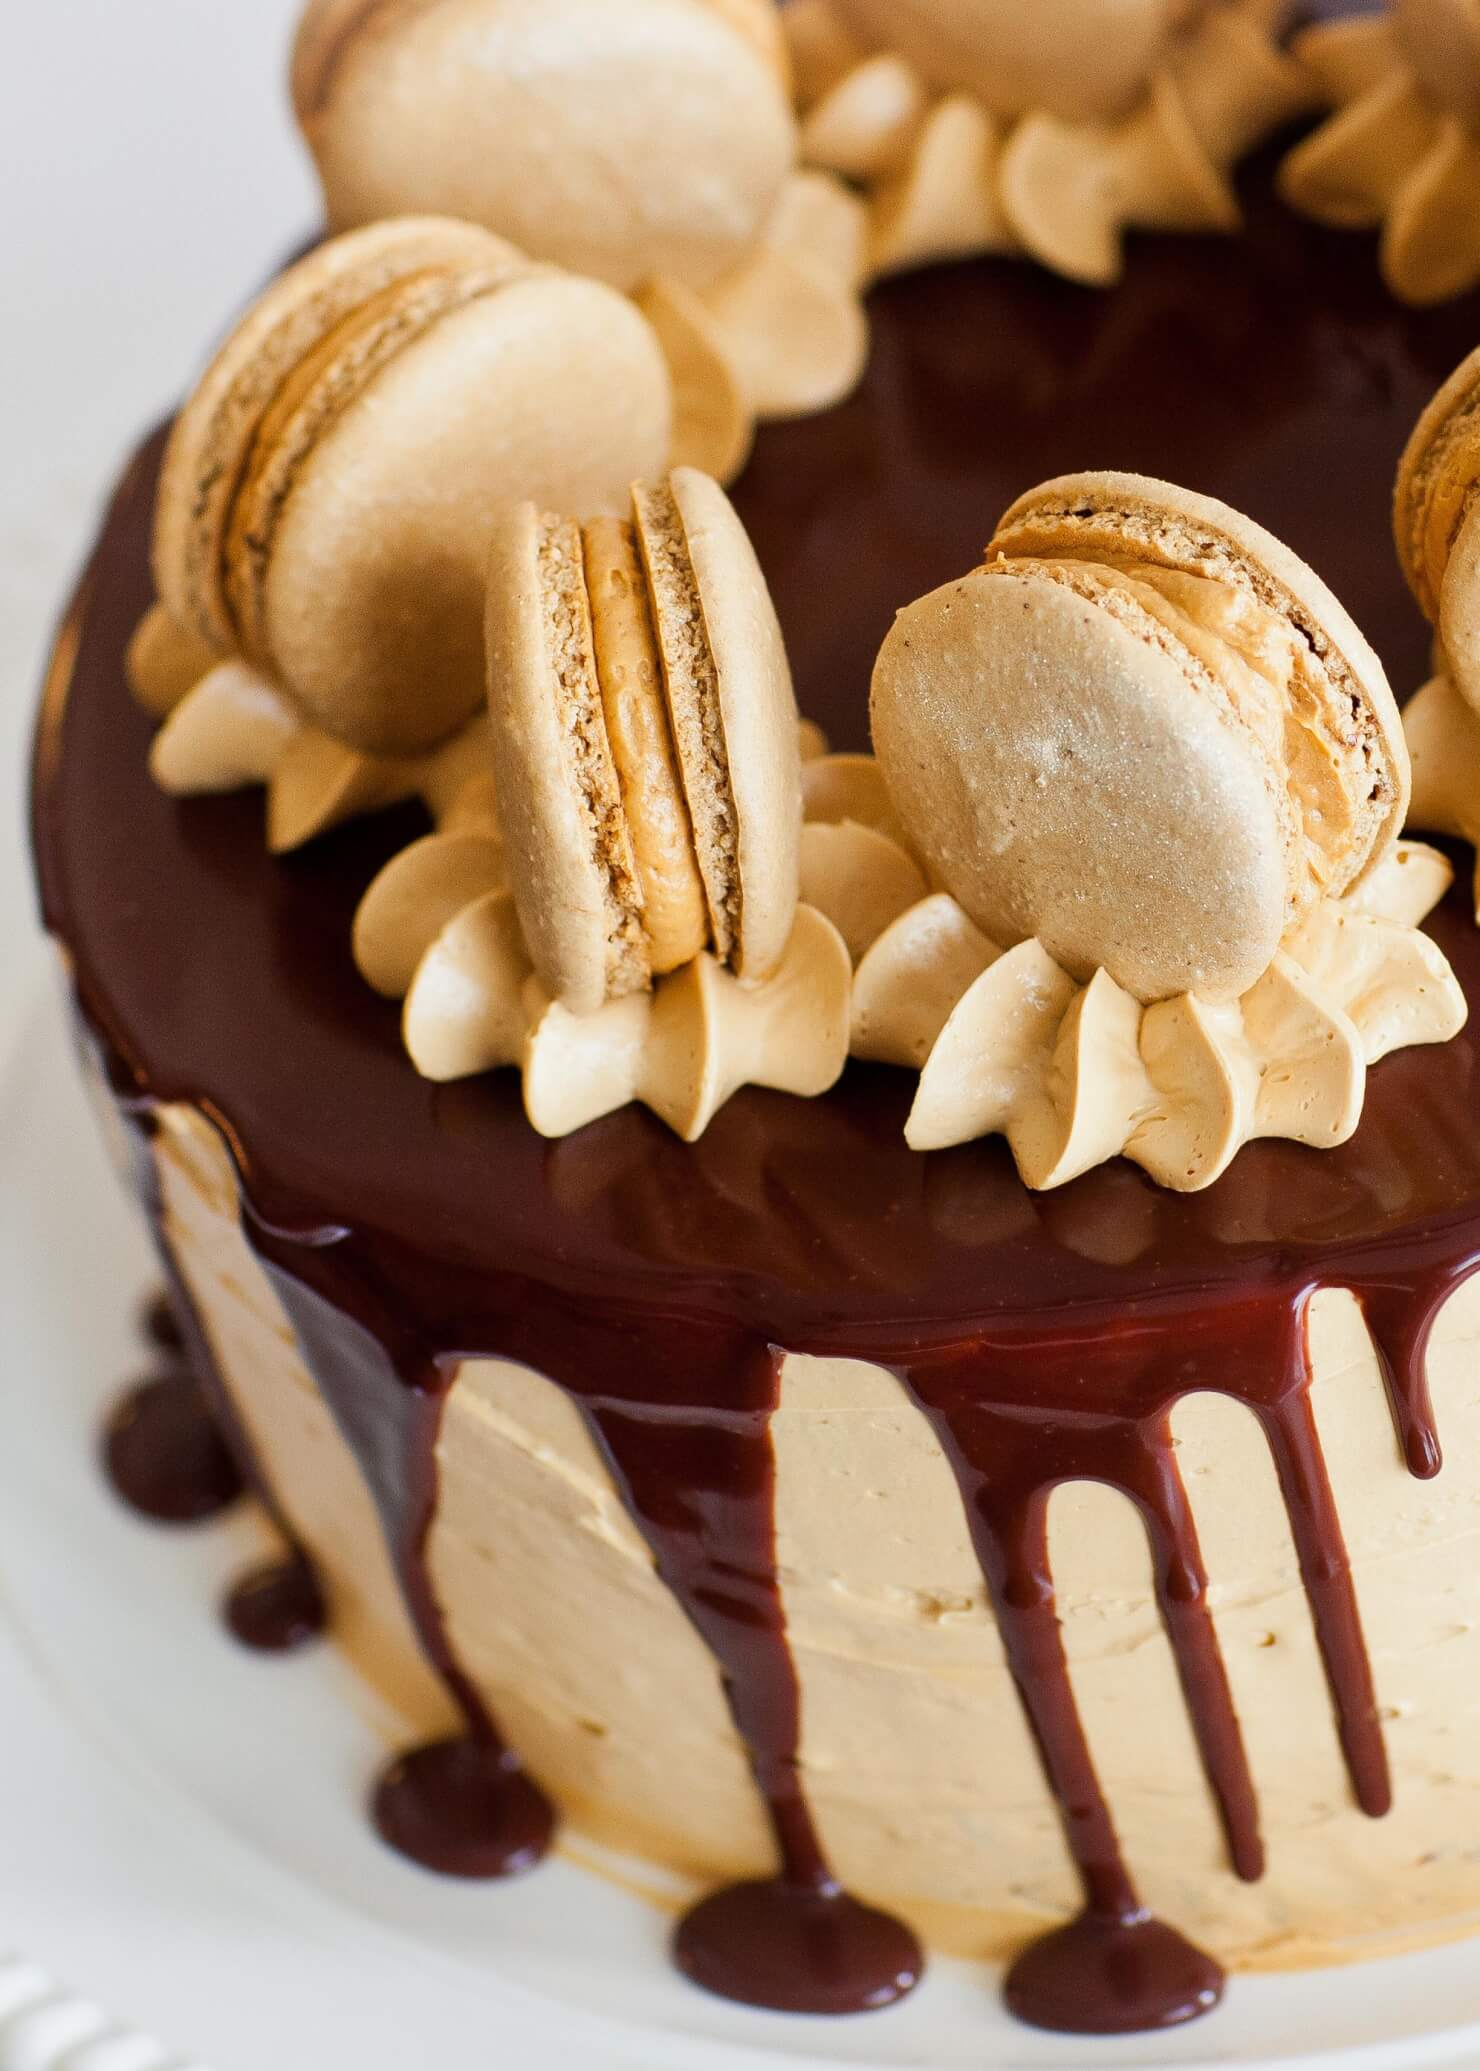 coffee caramel chocolate cake with macarons